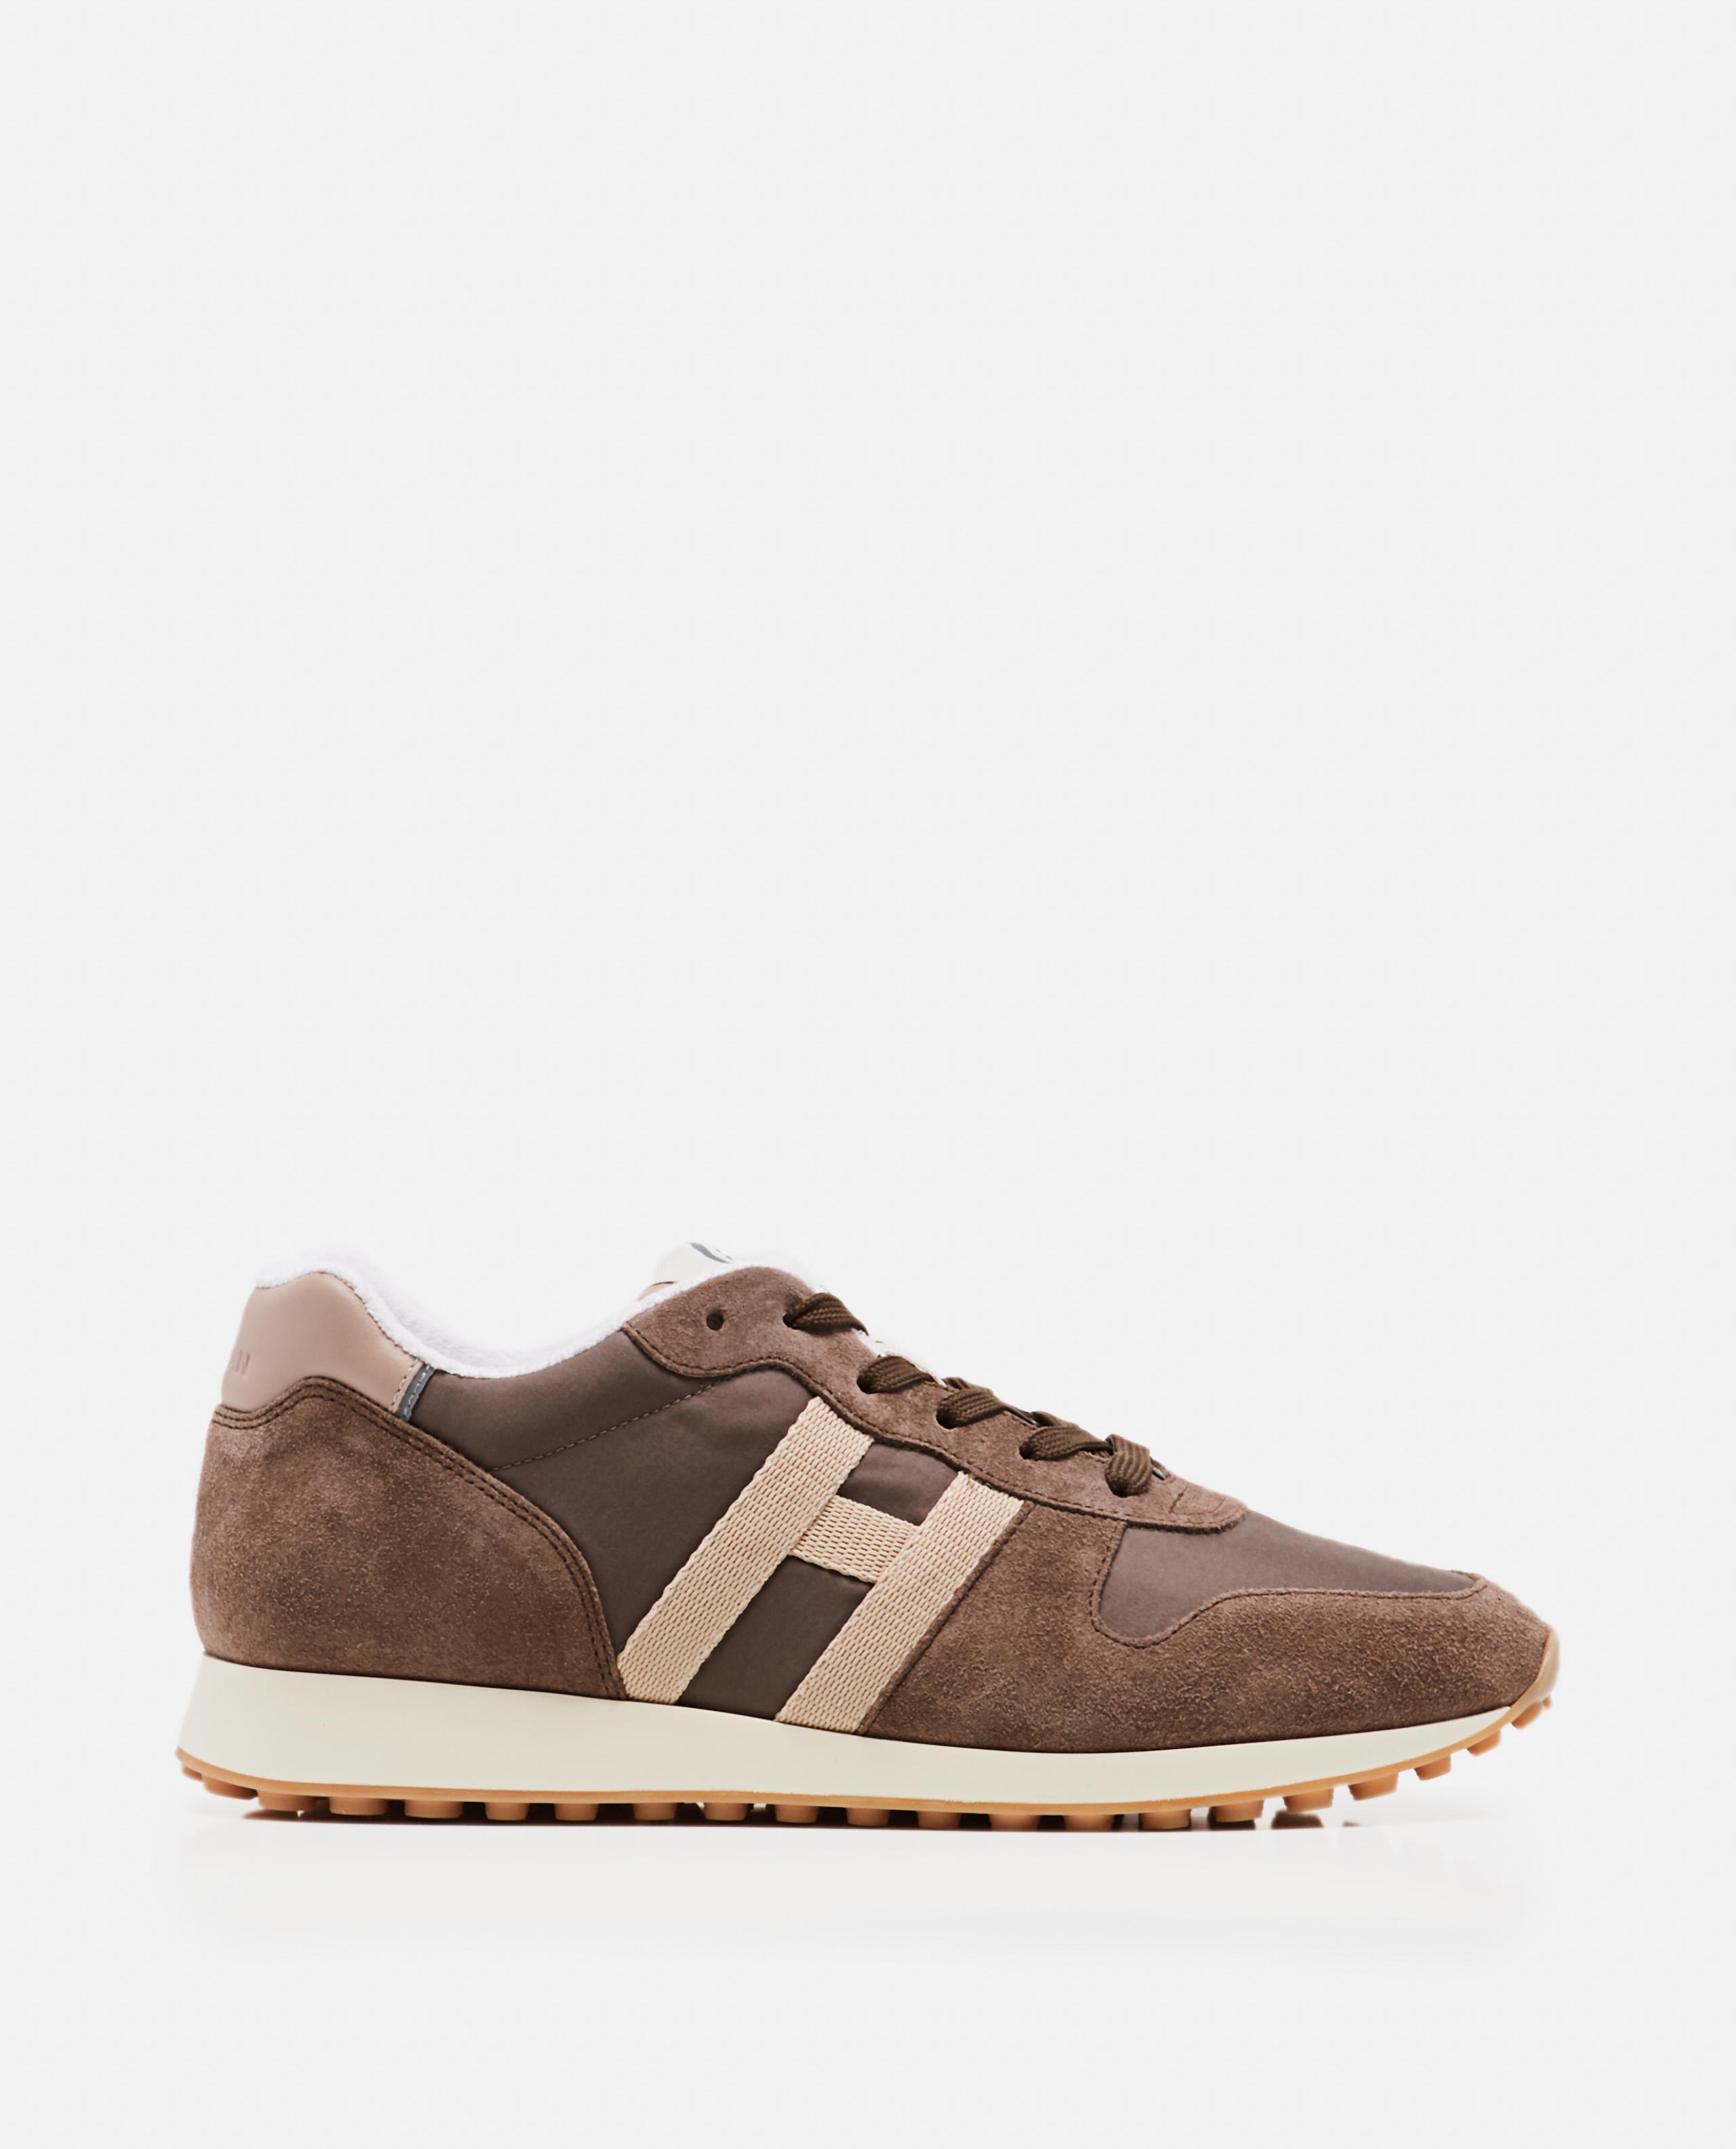 H429 low-top sneakers